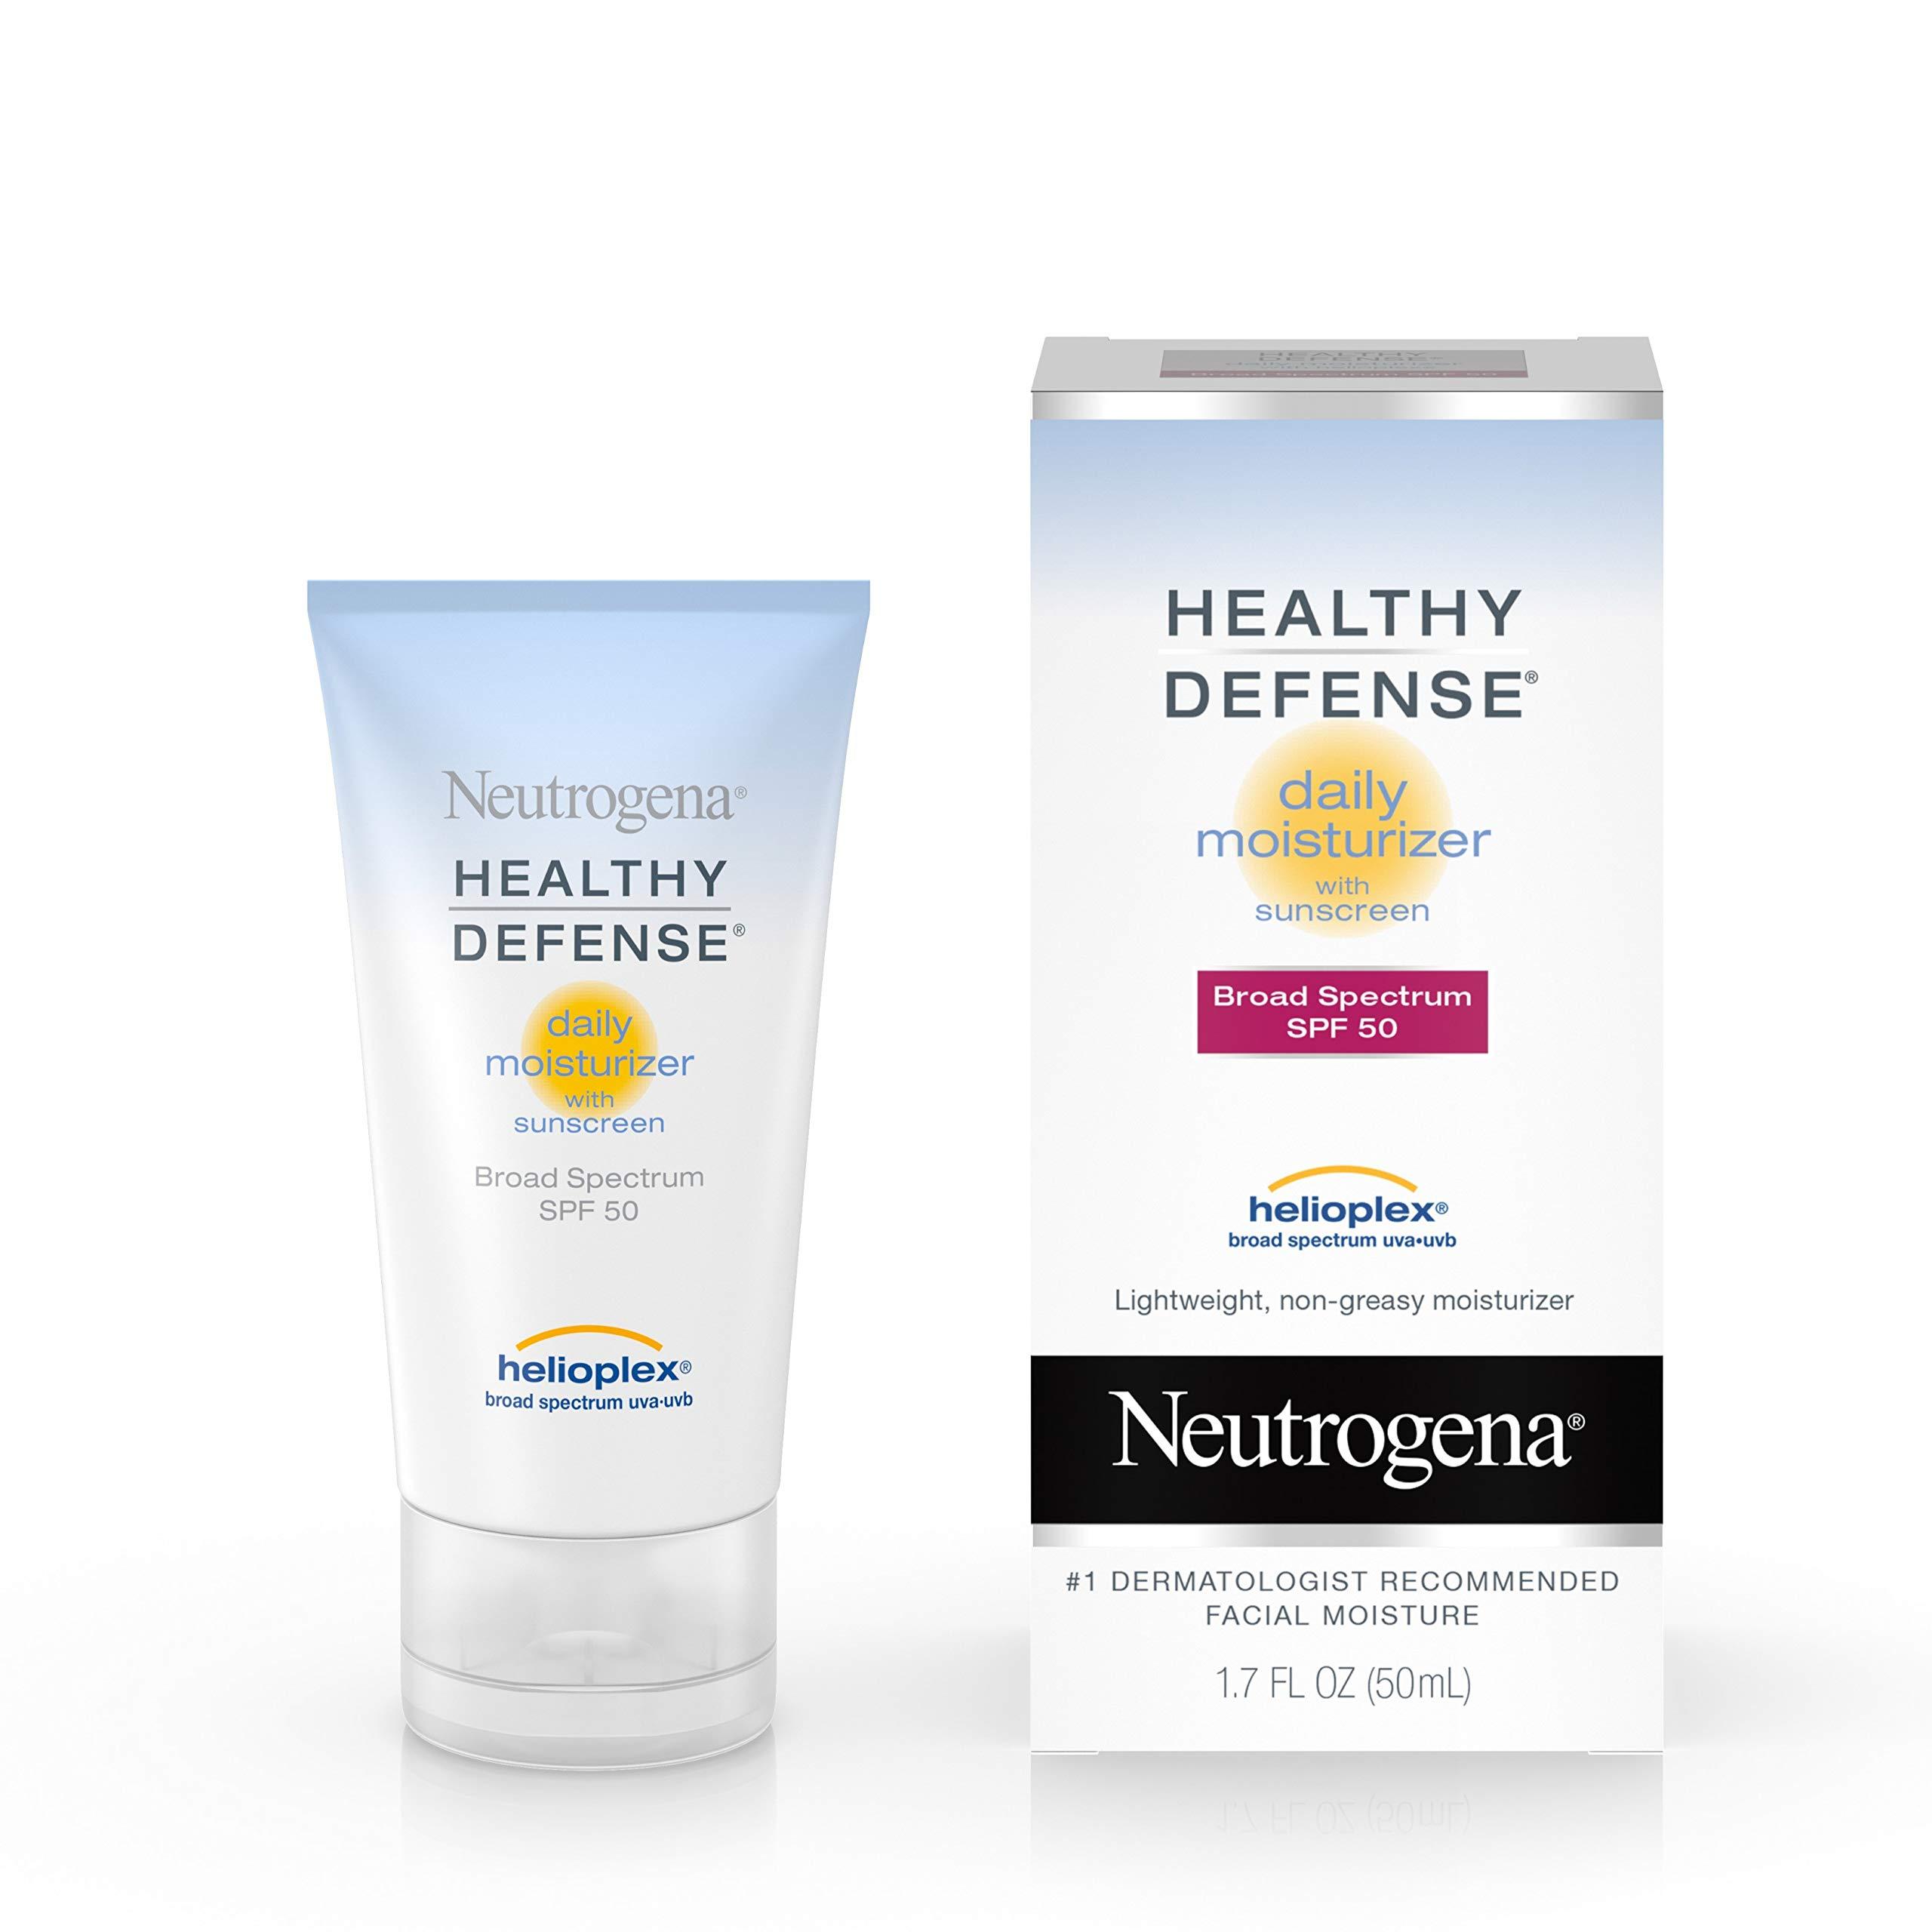 Neutrogena Healthy Defense Daily Moisturizer with Broad Spectrum SPF 50 Sunscreen, Vitamin E & Anti-Oxidants, Lightweight, Non-Greasy & Hypoallergenic, 1.7 fl. oz